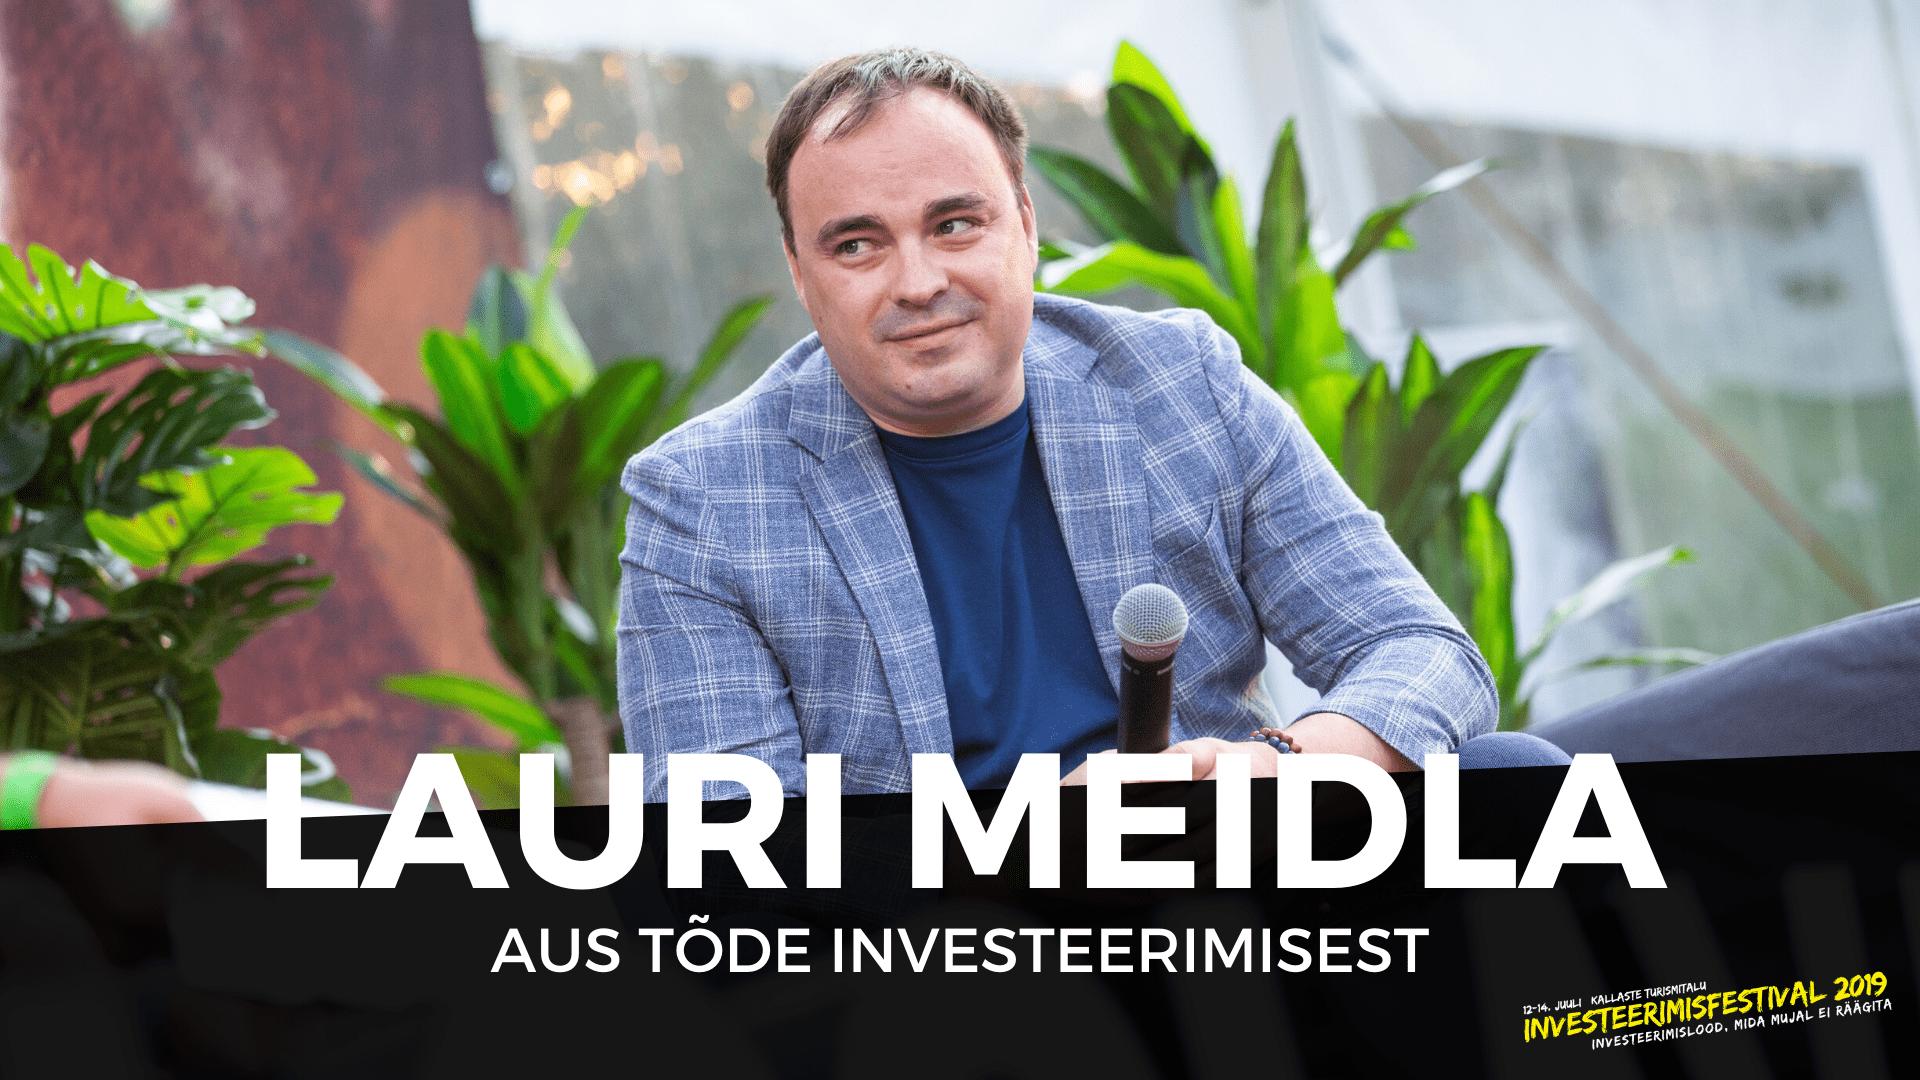 Lauri Meidla